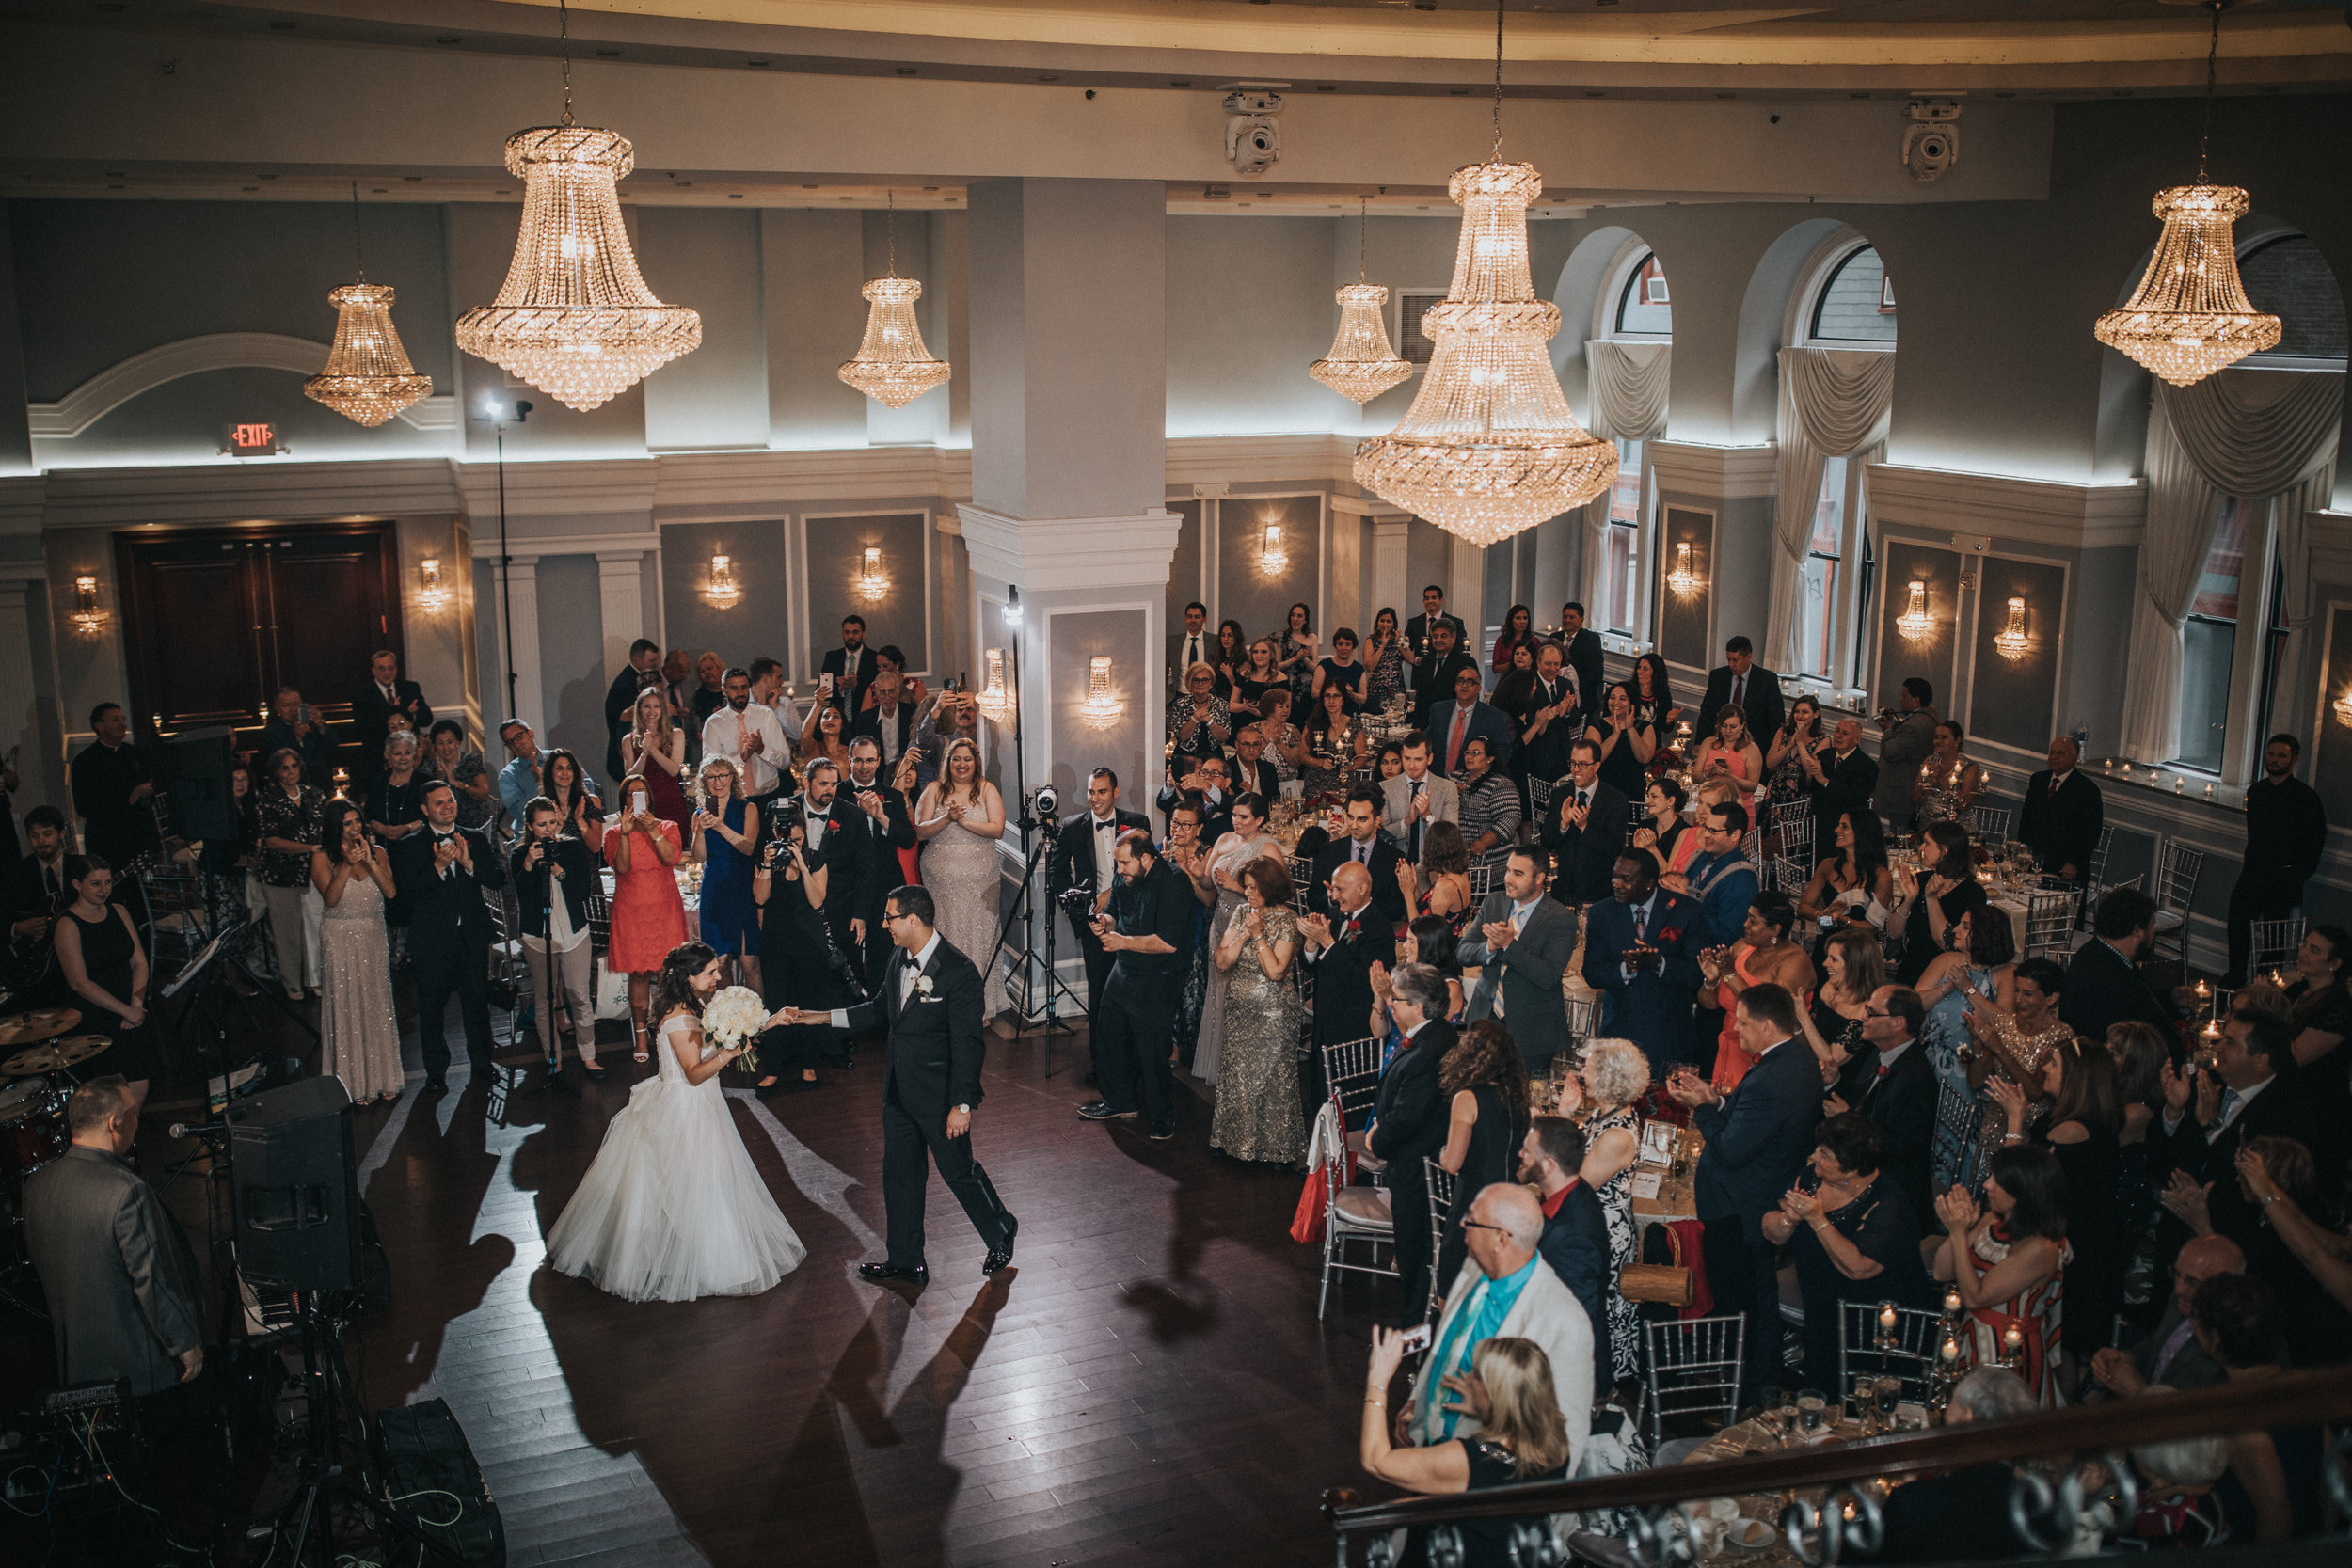 JennaLynnPhotography-NJWeddingPhotographer-Philadelphia-Wedding-ArtsBallroom-Reception-63.jpg